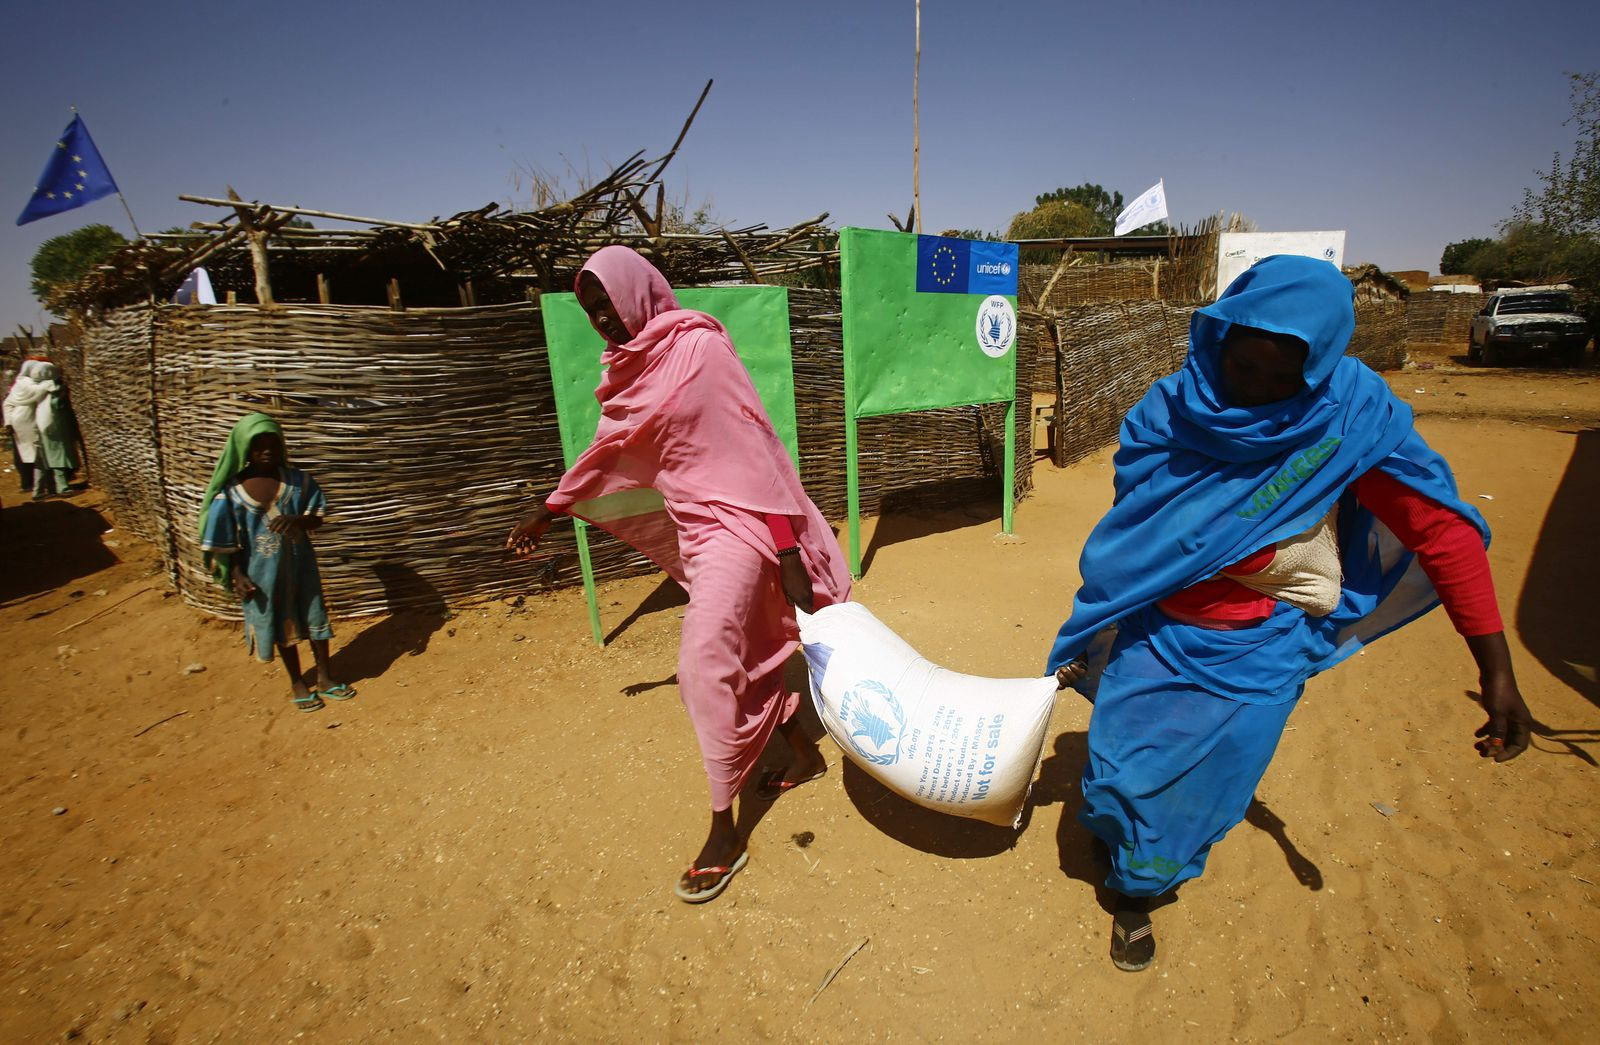 FILES-SUDAN-UNREST-DARFUR